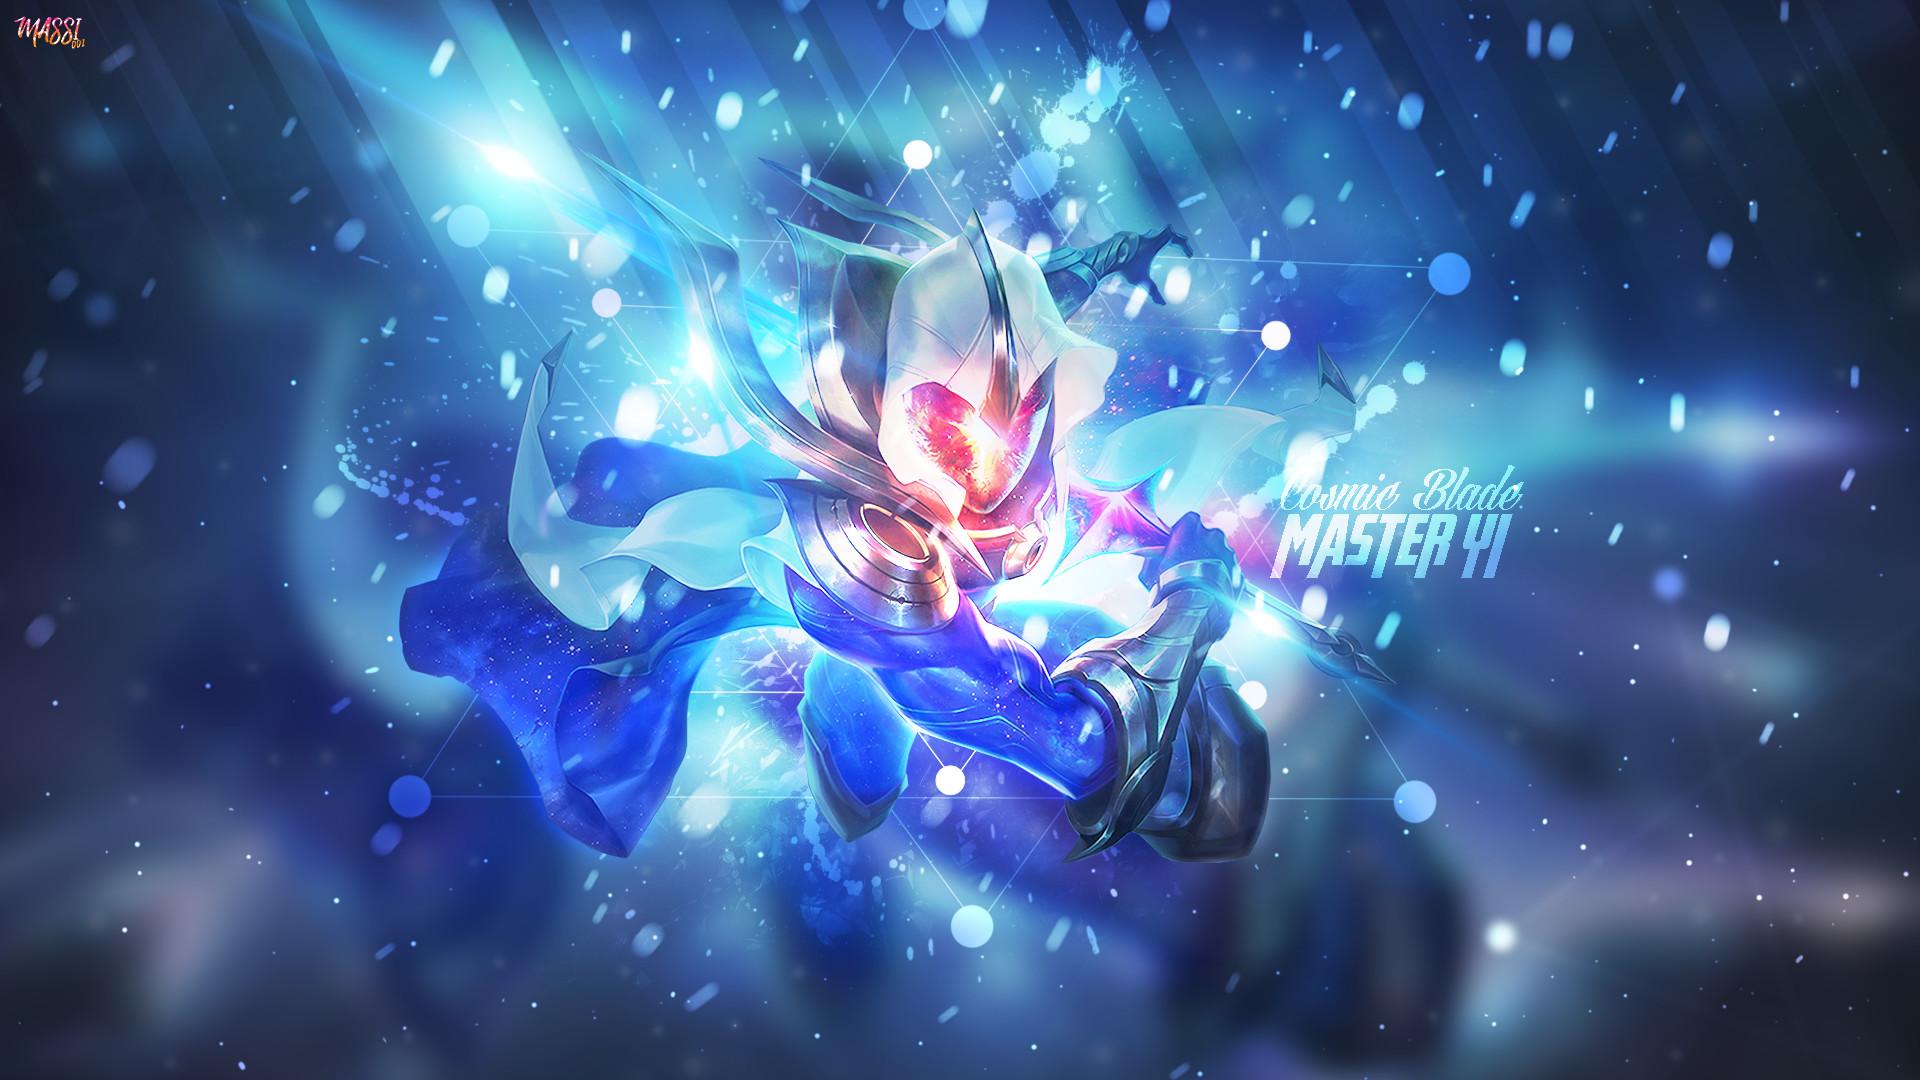 Cosmic Blade Master Yi 2336026 Hd Wallpaper Backgrounds